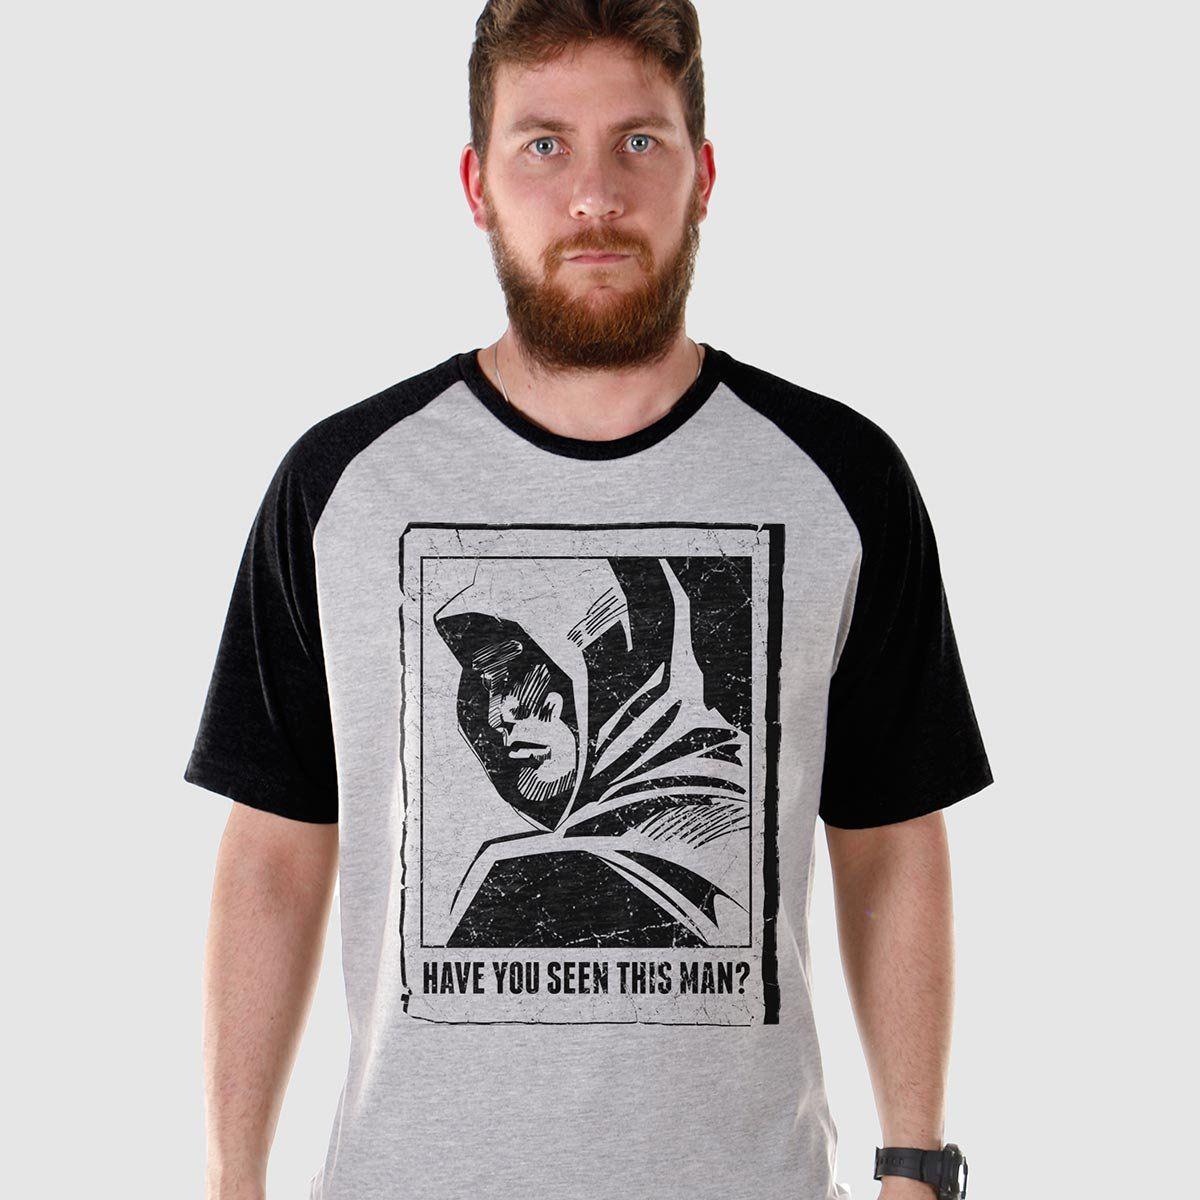 Camiseta Raglan Masculina Arrow Have You Seen This Man?  - bandUP Store Marketplace